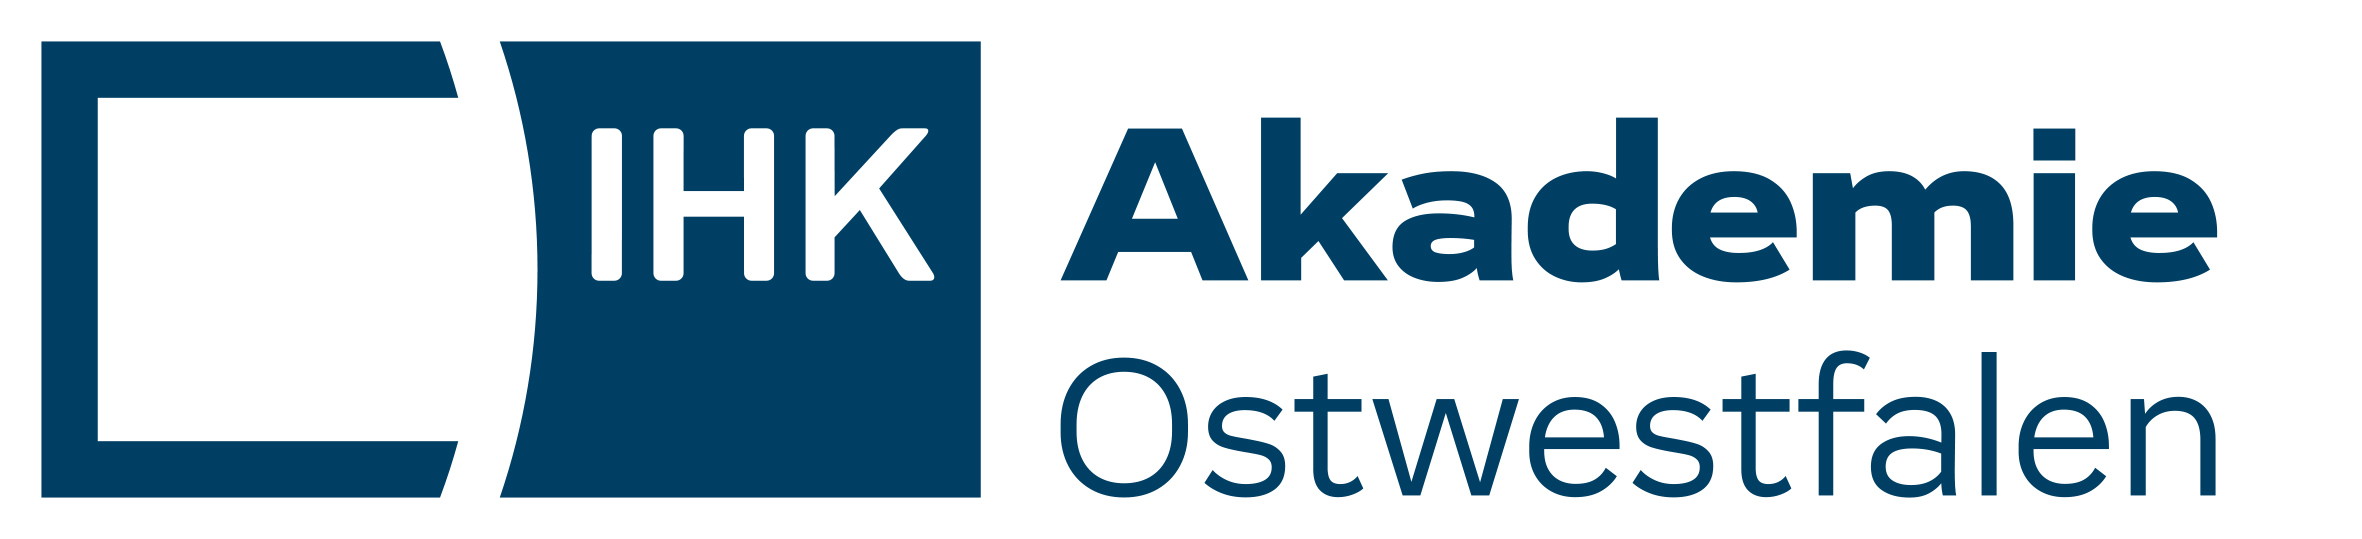 IHK Akademie Logo